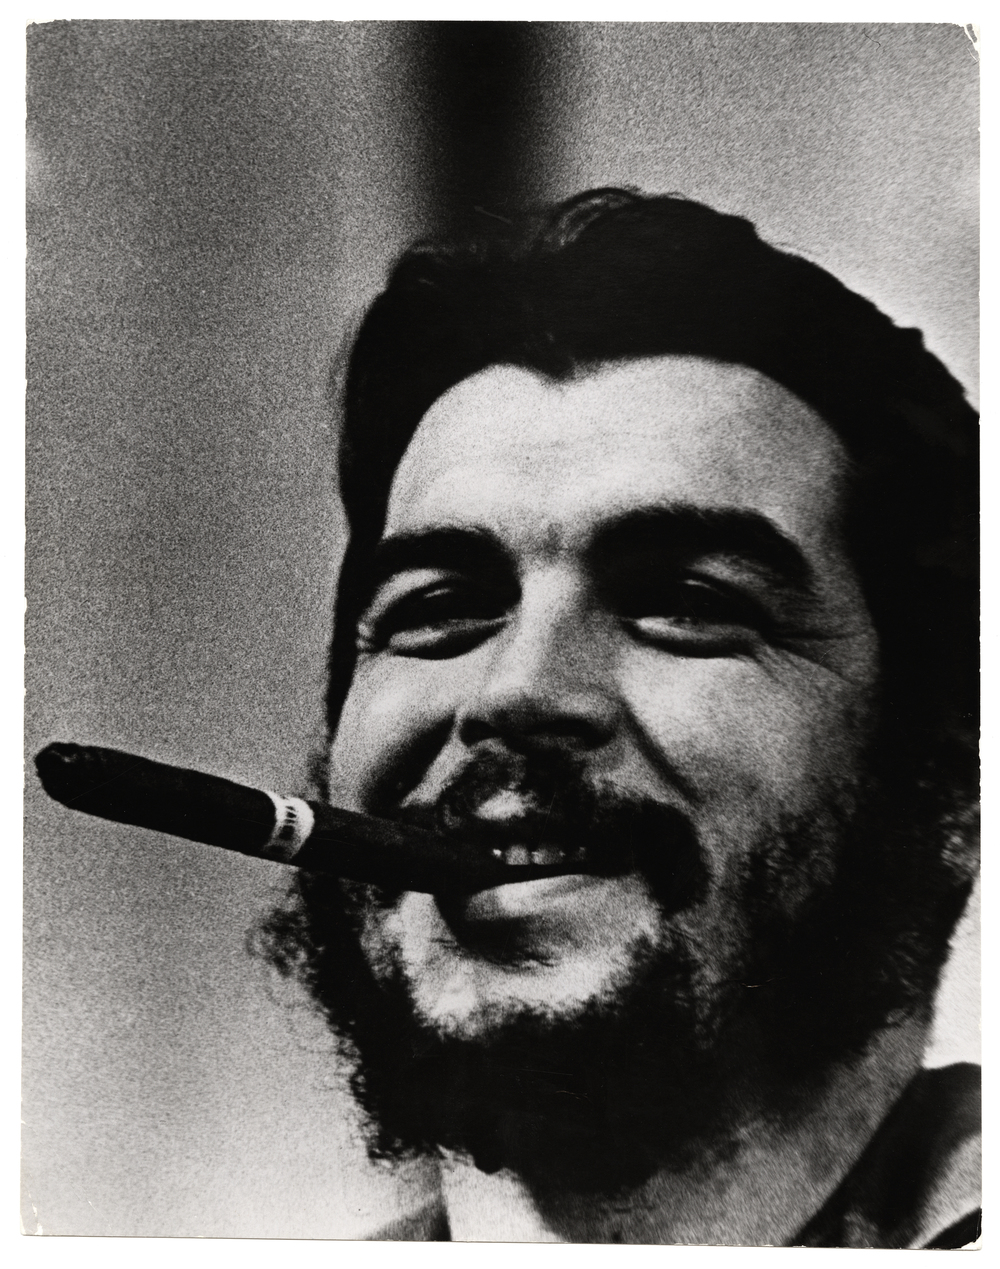 Osvaldo Salas, Che Guevara, c.1962